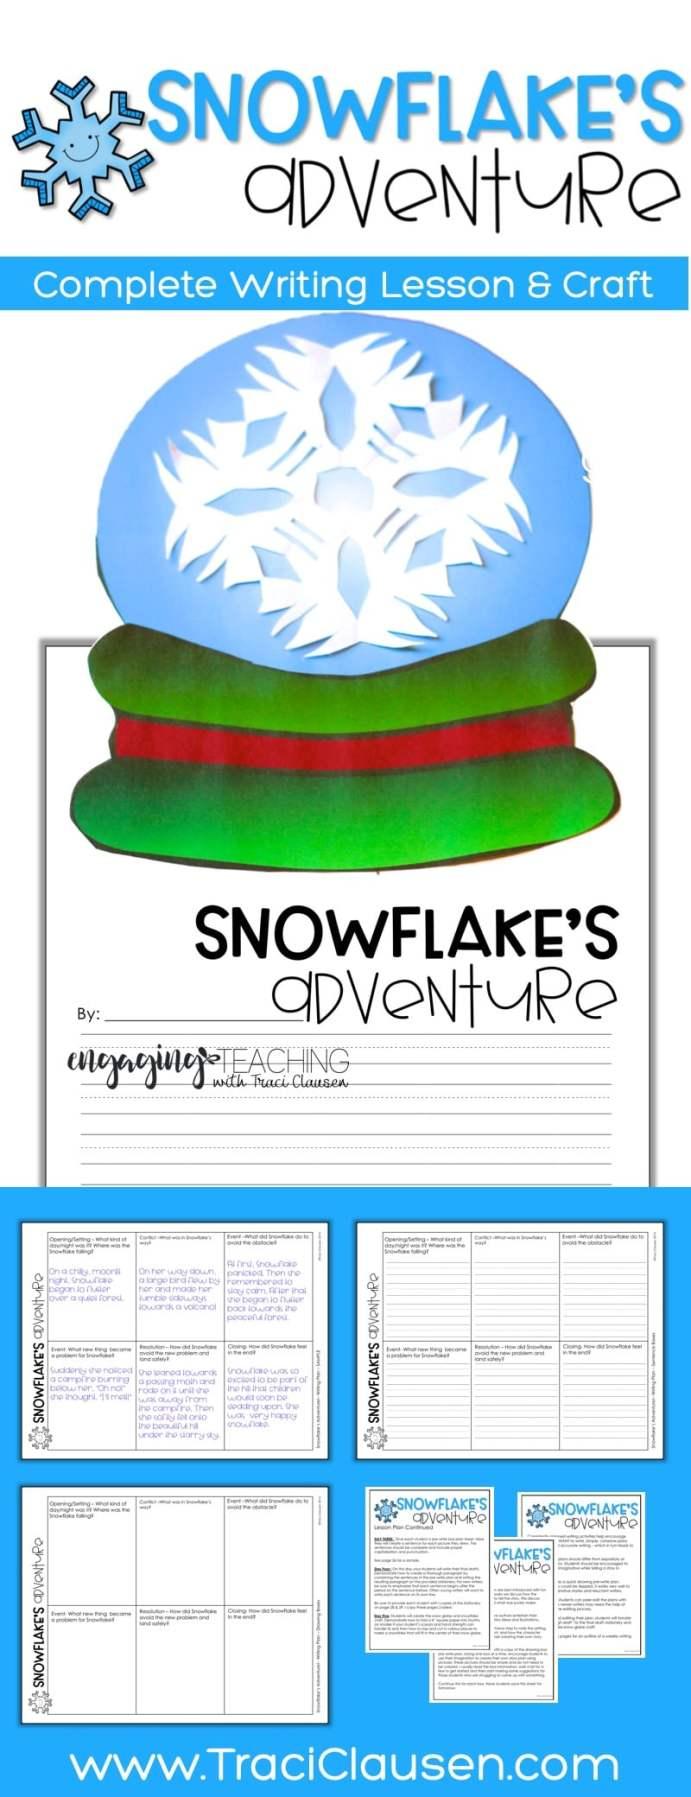 Snowflake's Adventure Writing Lesson